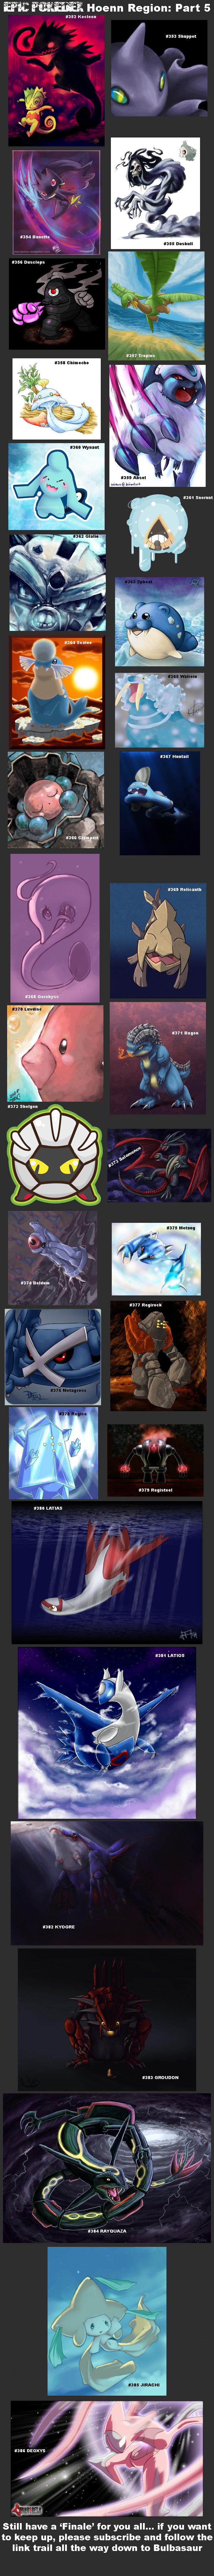 Epic Pokedex Hoenn Region Part 5. Part 4:<br /> /funny_pictures/1591151/Epic+Pokedex+Hoenn+Region+Part+4/<br /> Part 3:<br /> /funny_pictures/ Pokemon Art schryevii Pokedex Epic hoenn